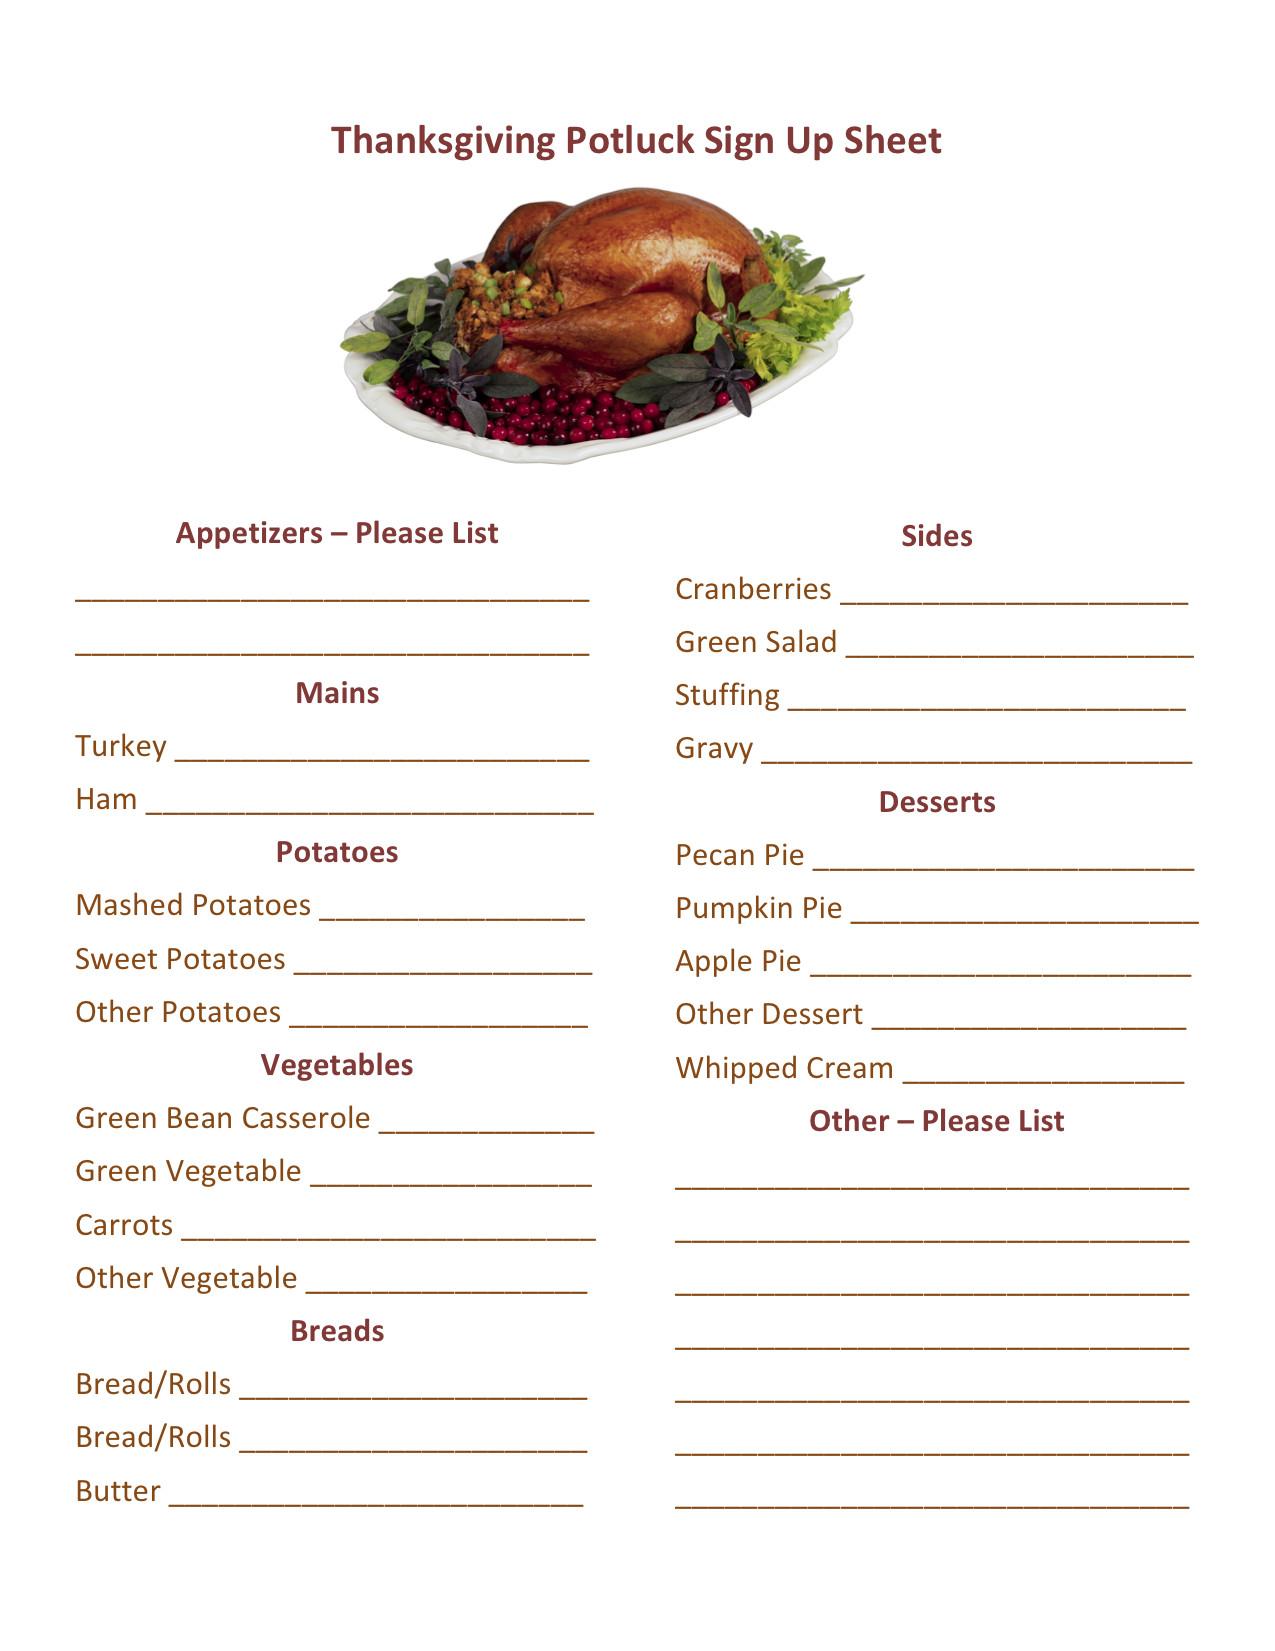 Christmas Potluck Signup Sheet Template Thanksgiving Potluck Sign Up Printable